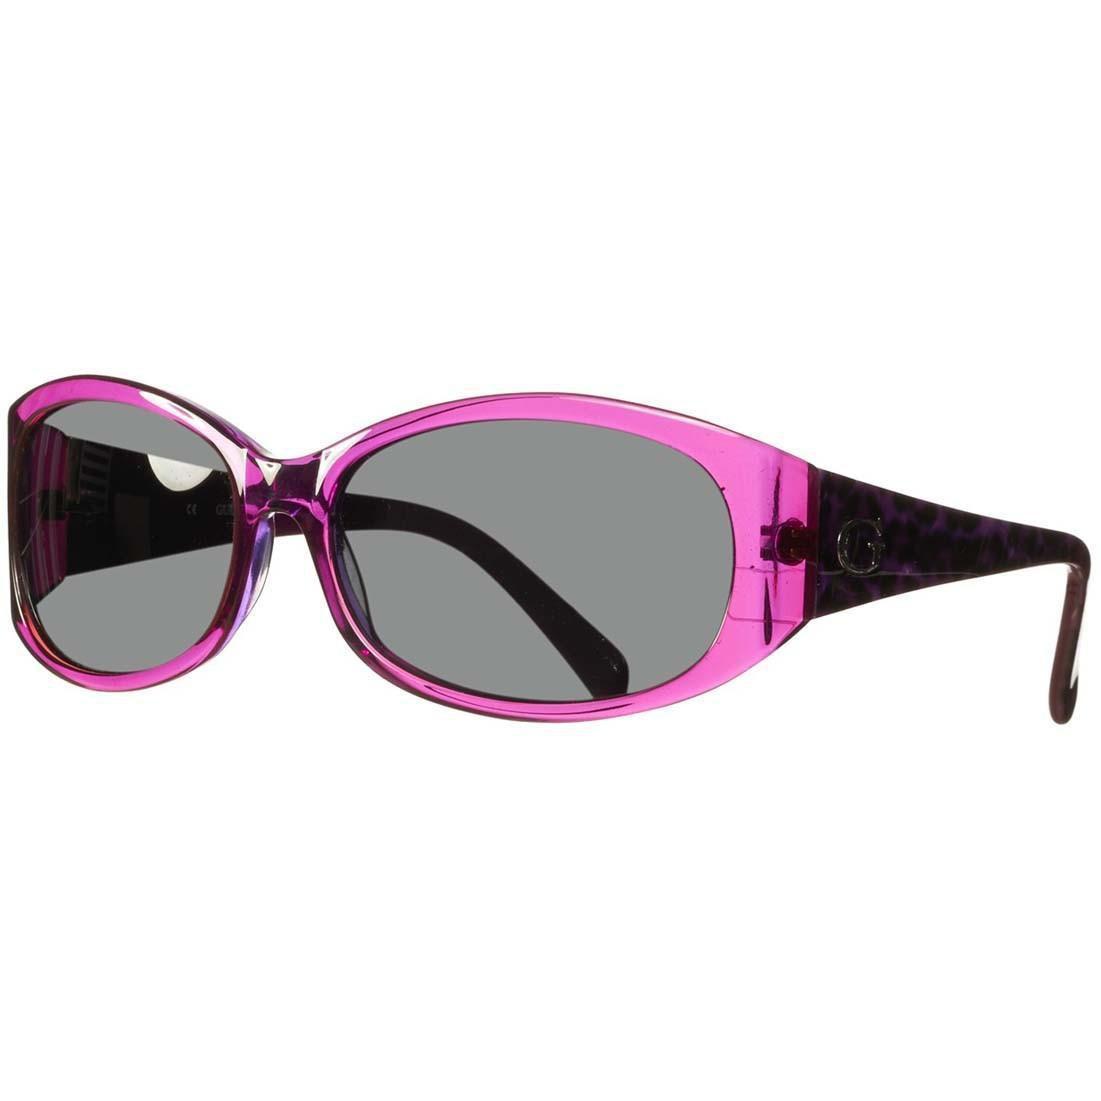 GUESS Women Purple Sunglasses GU7377 PUR-3 New w/ Case